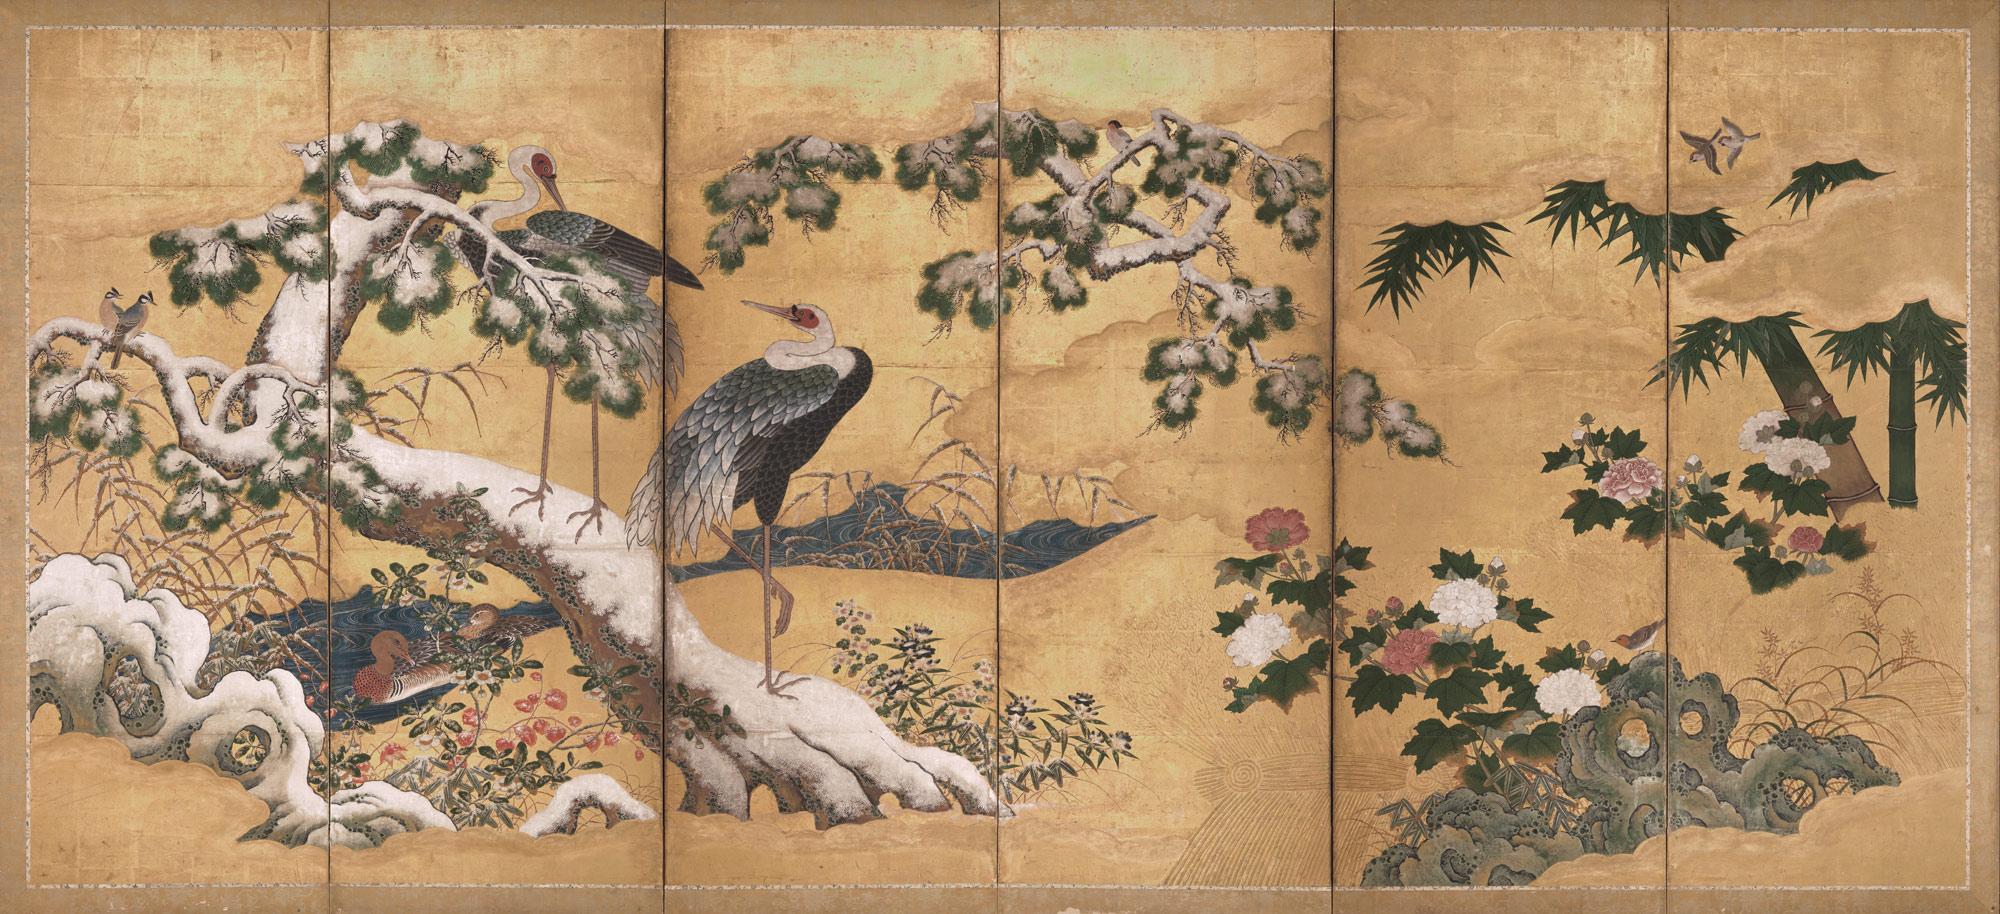 Total War Shogun 2 Fall Of The Samurai Wallpaper Hd Seasonal Imagery In Japanese Art Essay The